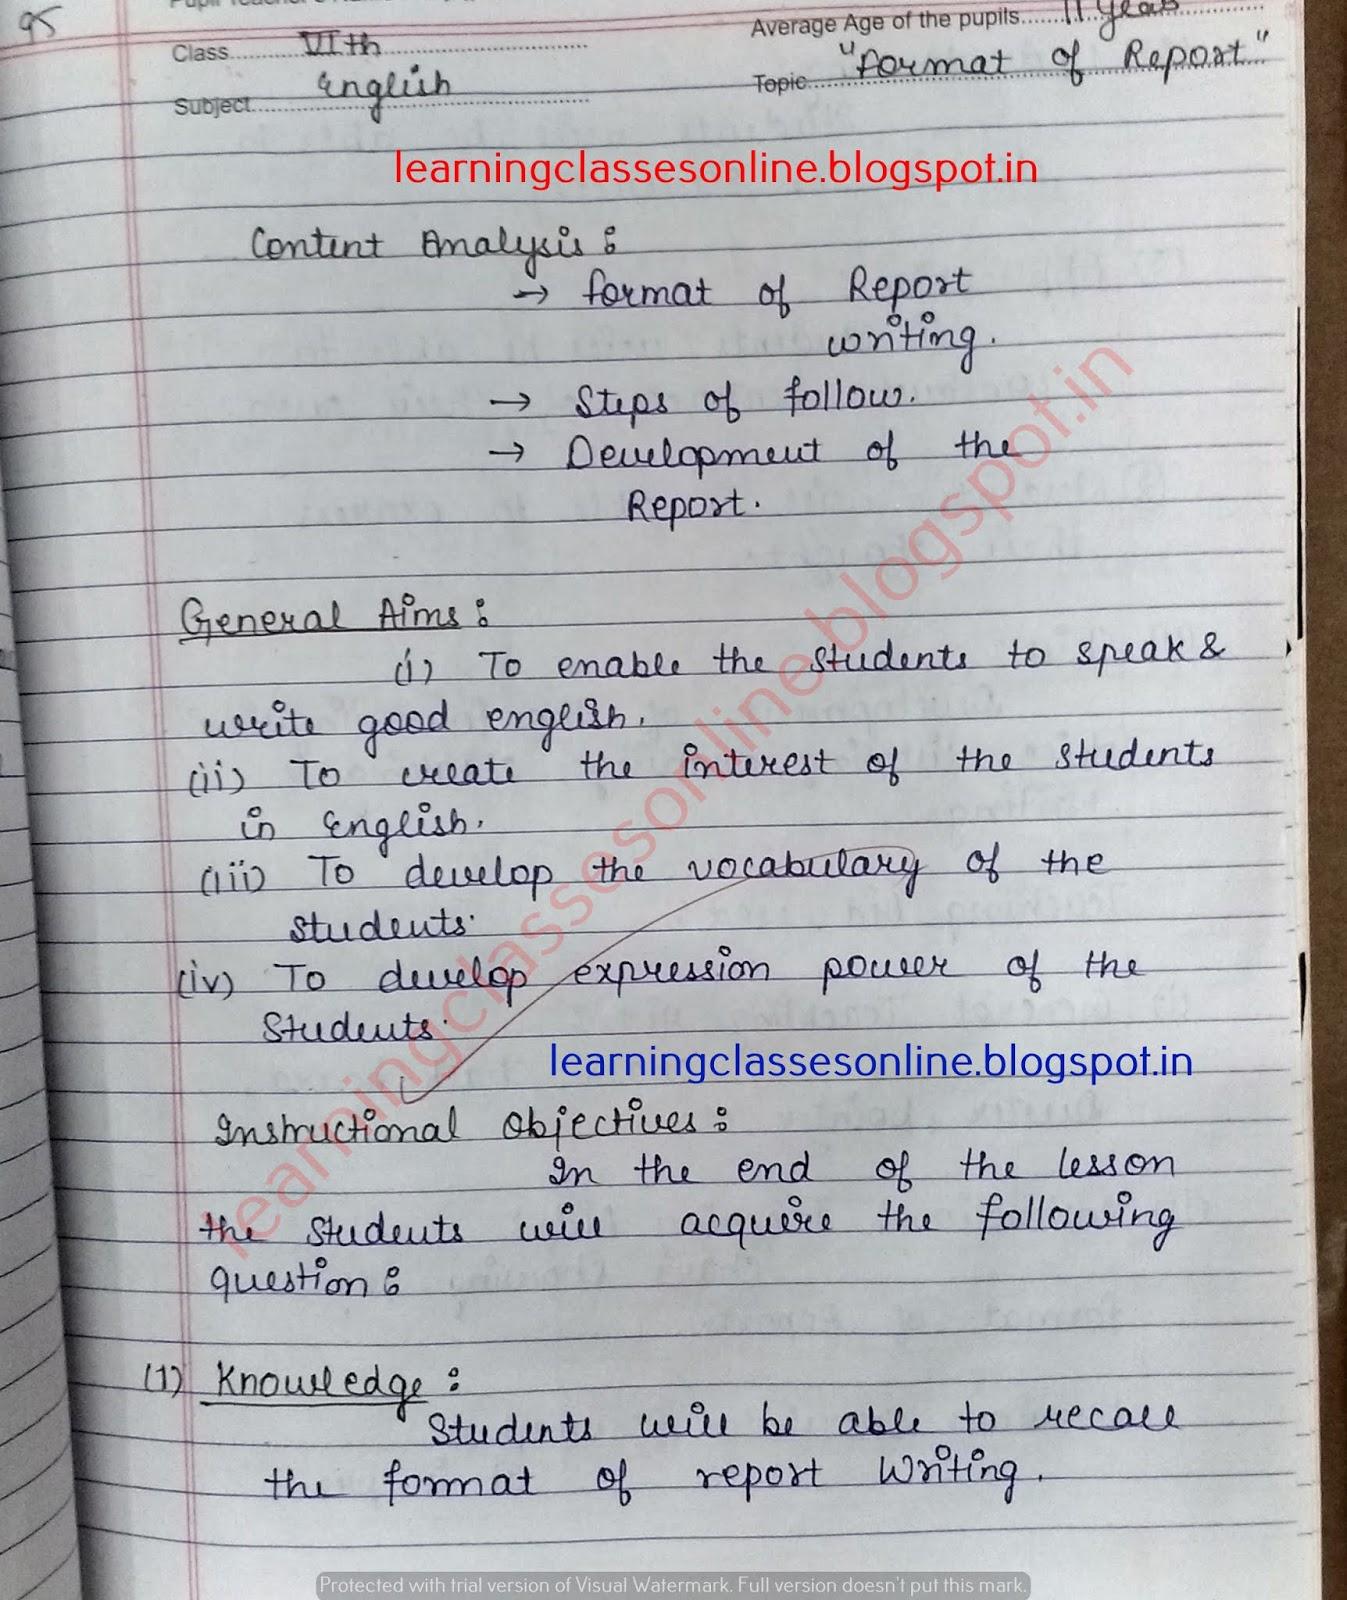 Teacher Teaching Lessons - Mega Lesson Plans - Topic (Format of Report) - English Lesson Plan B.Ed